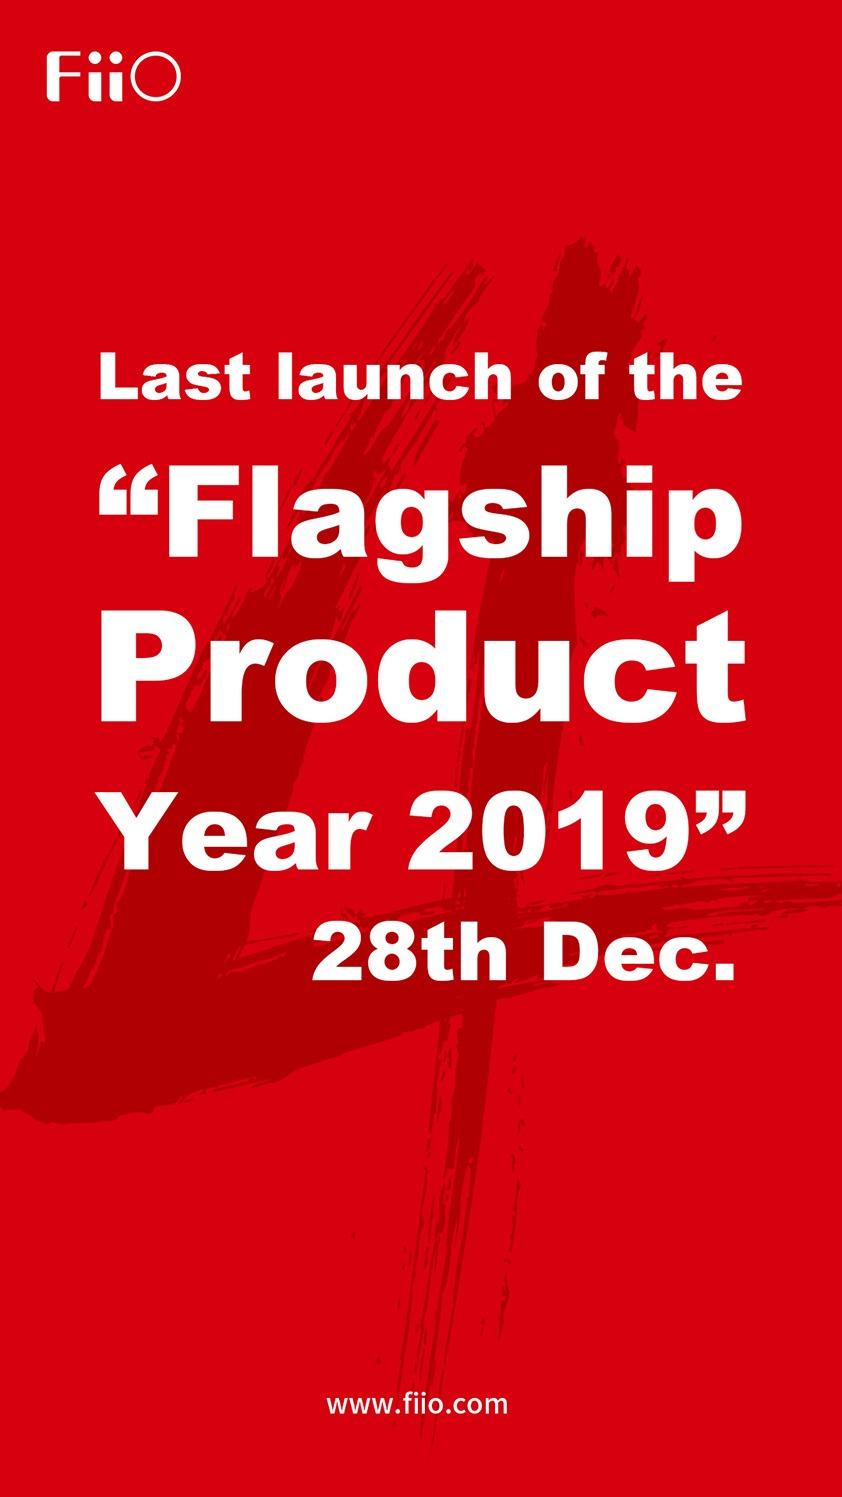 FiiO 2019 Last Launch Event to Be Held on December 28, 14:00 Beijing time(UTC + 8)